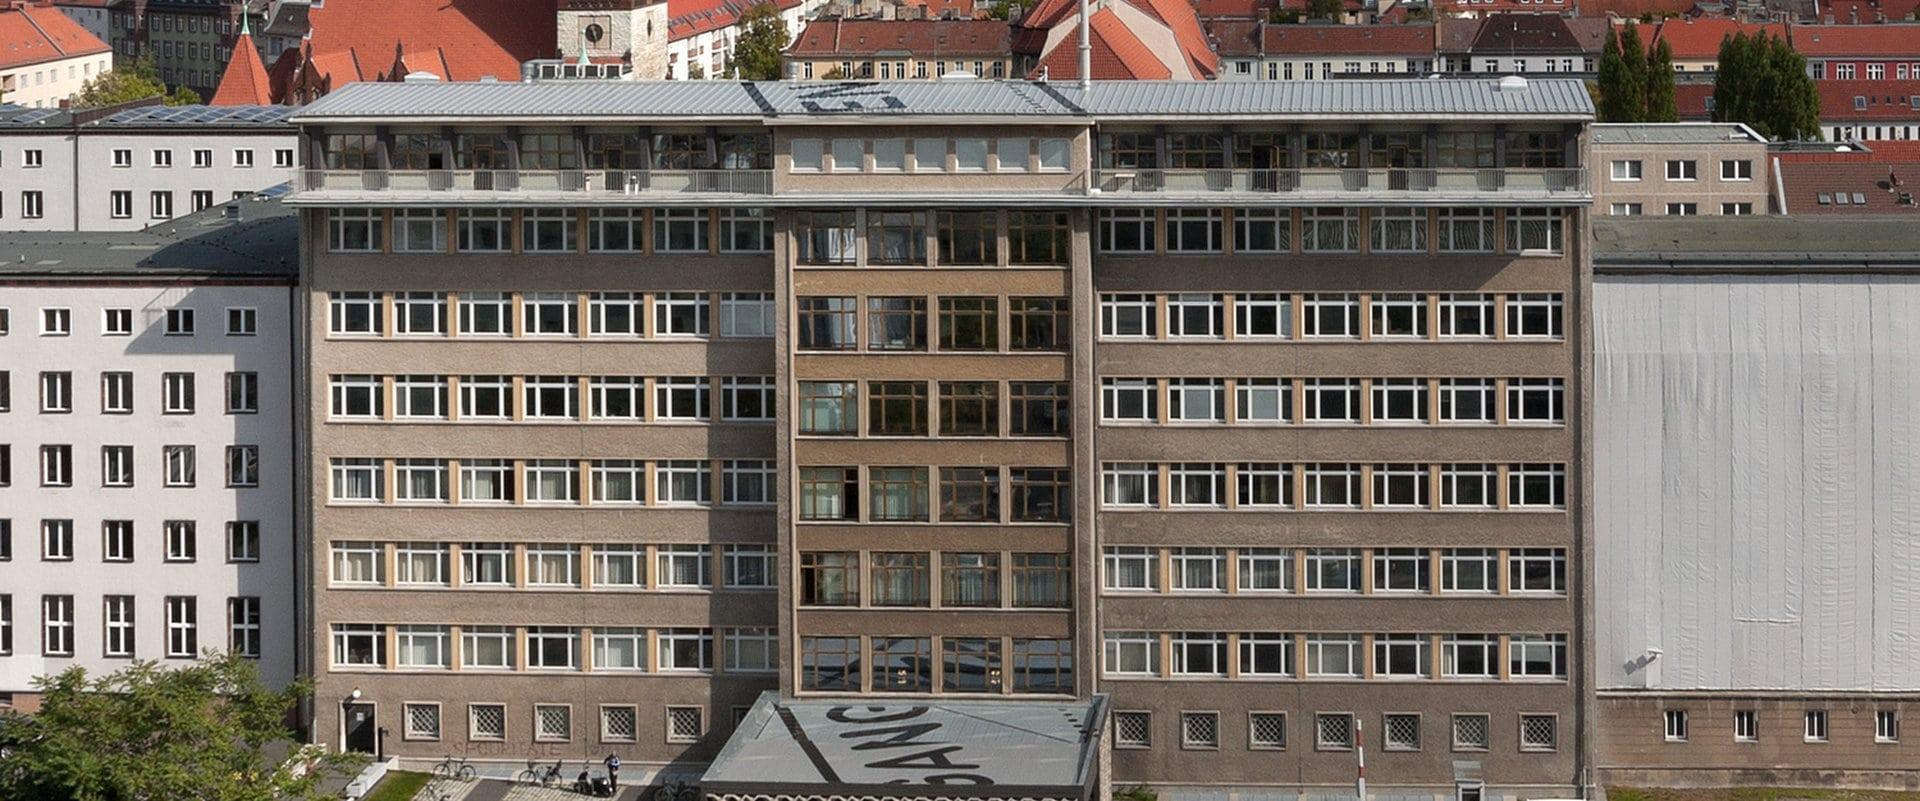 Studietur Berlin Stasi